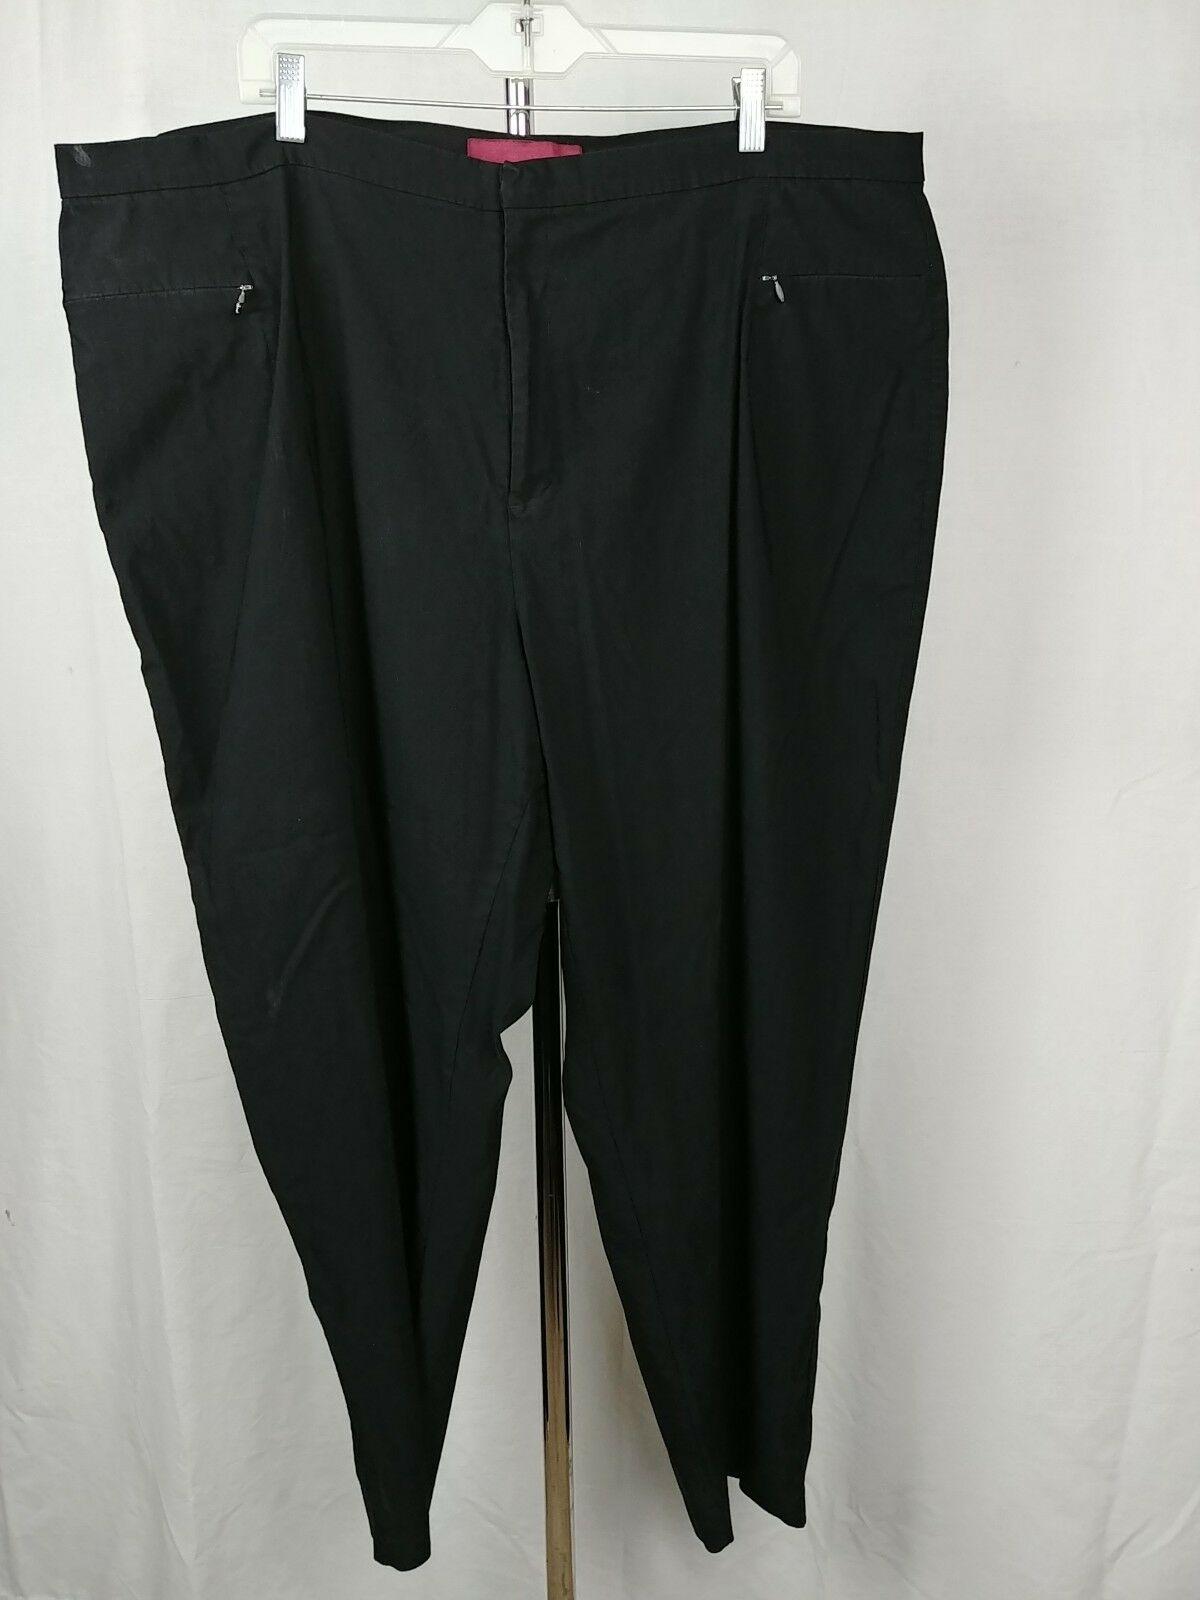 Merona Black Slacks Dress Pants Womens Plus Size 26WA 42x30